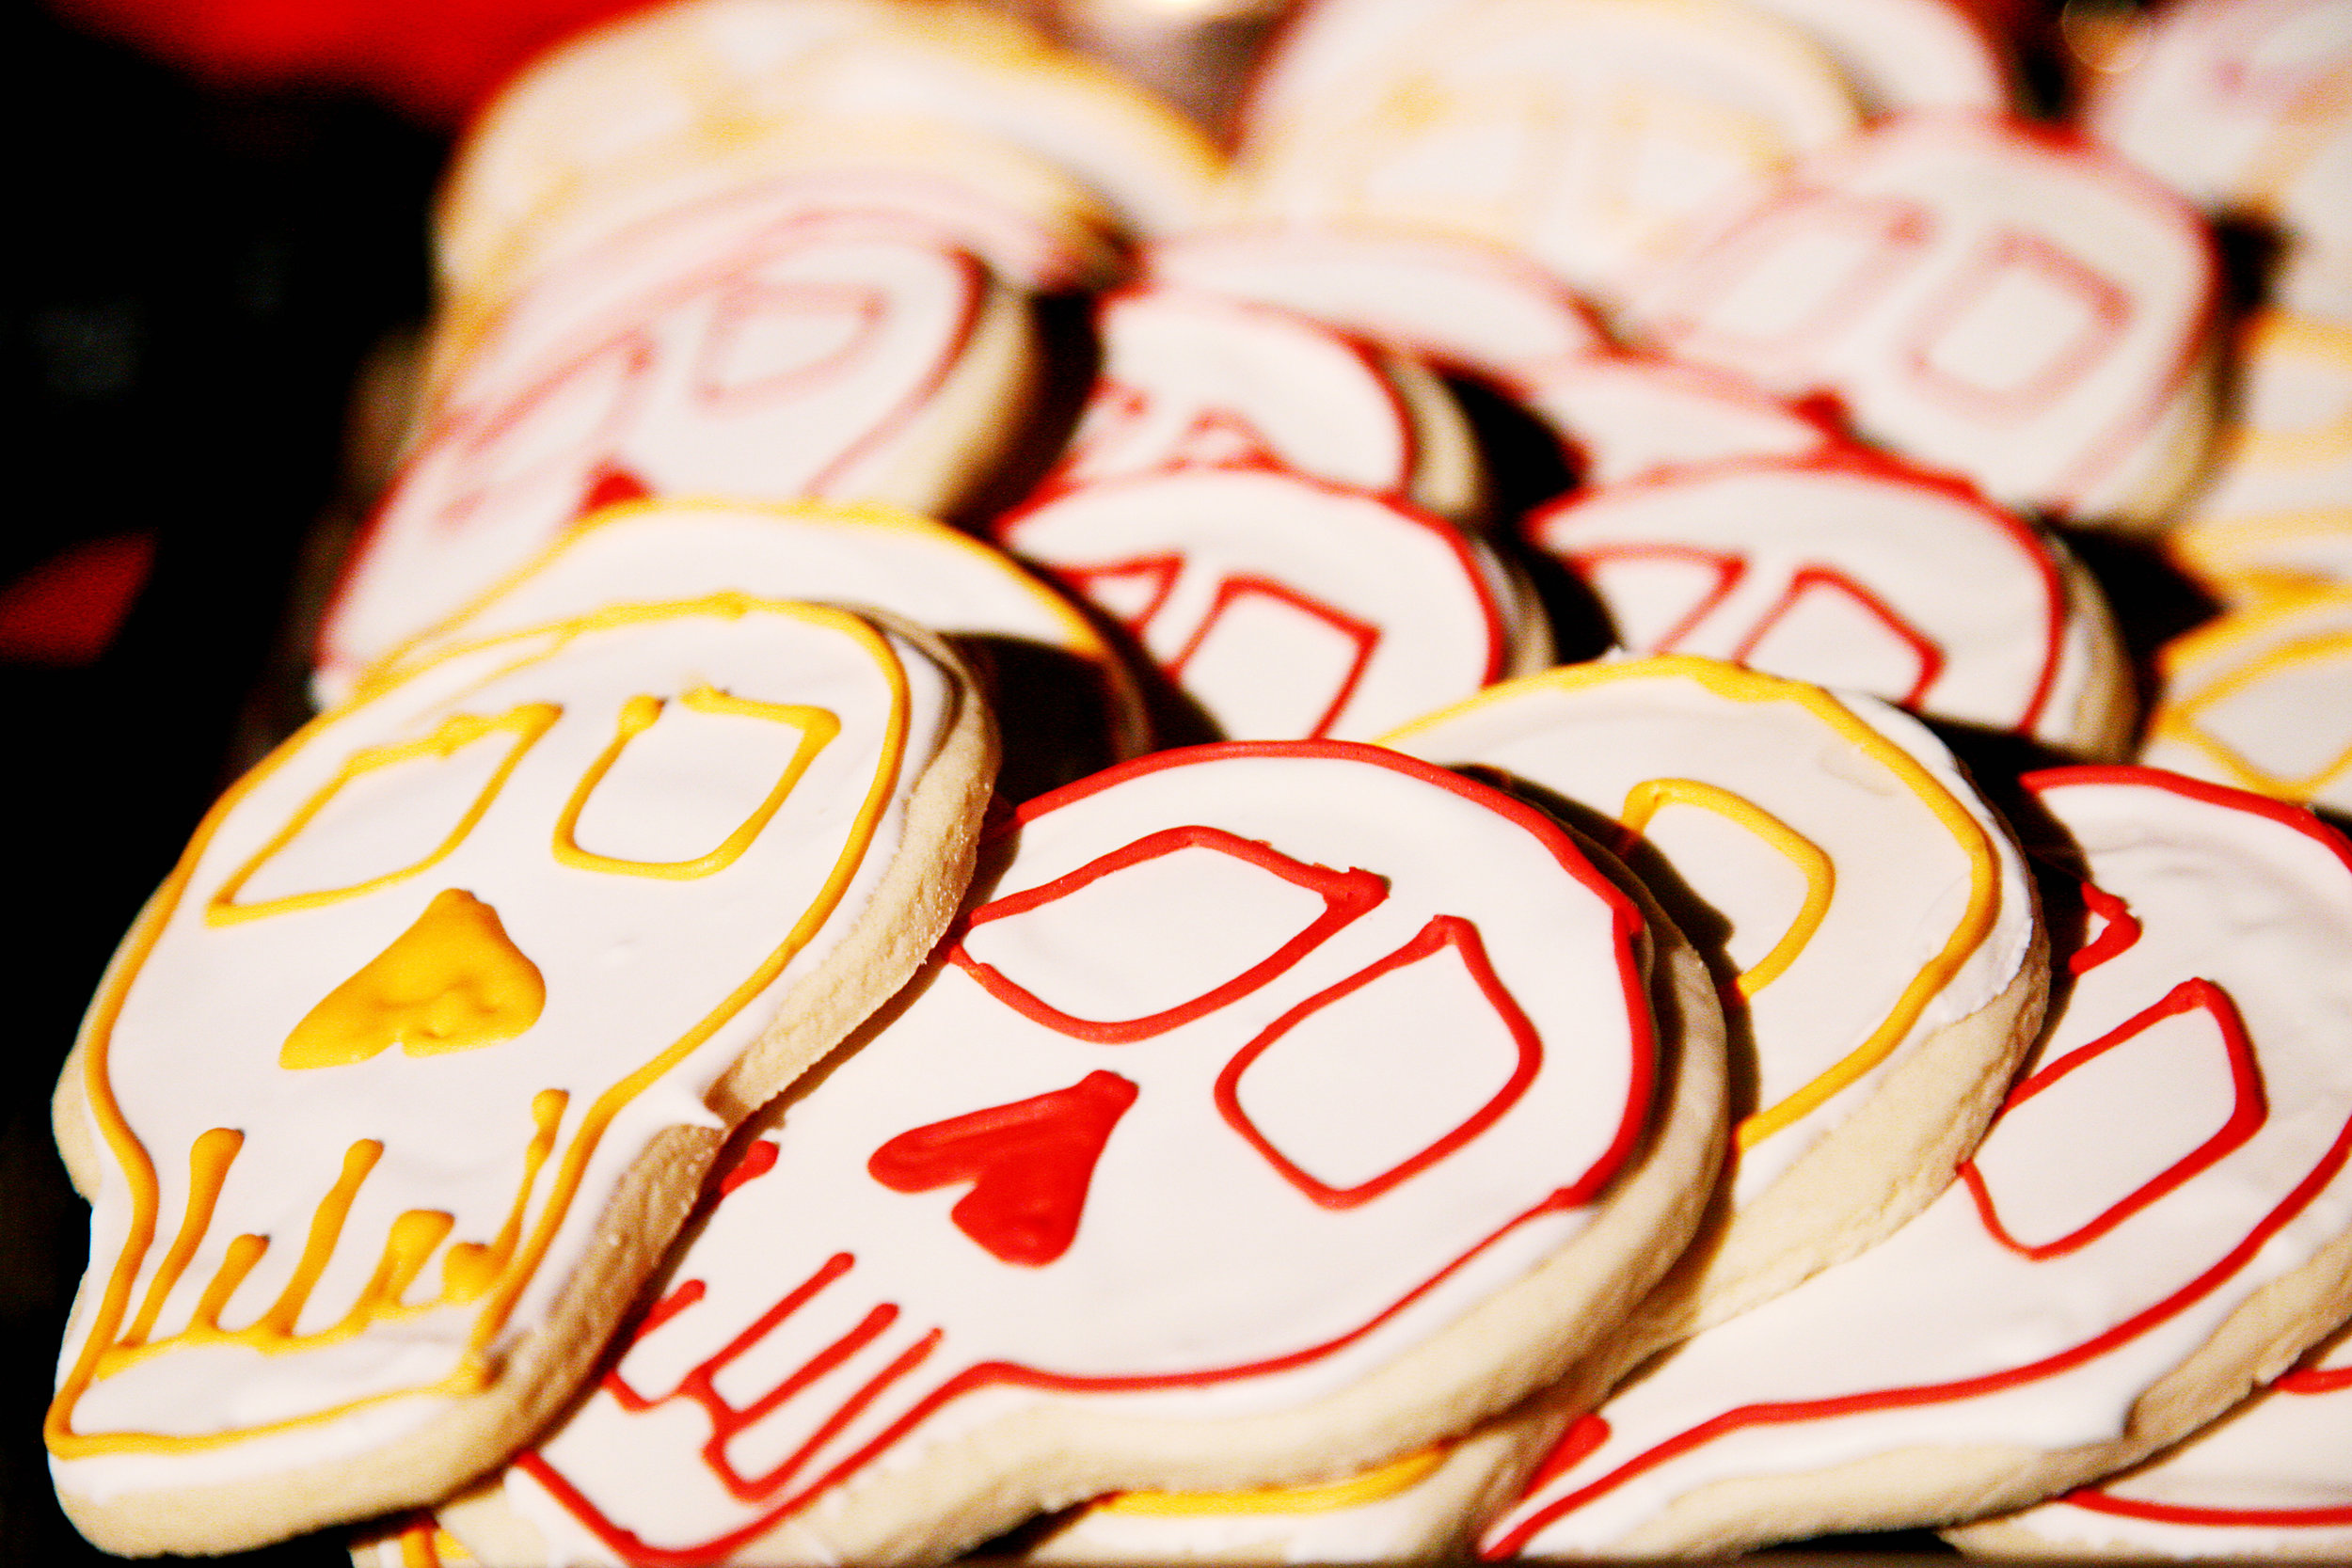 7 unique wedding desserts skull cookies red skull cookies yellow skull cookies wedding cookies  Jane Jordan Photography Life Design Event.jpg